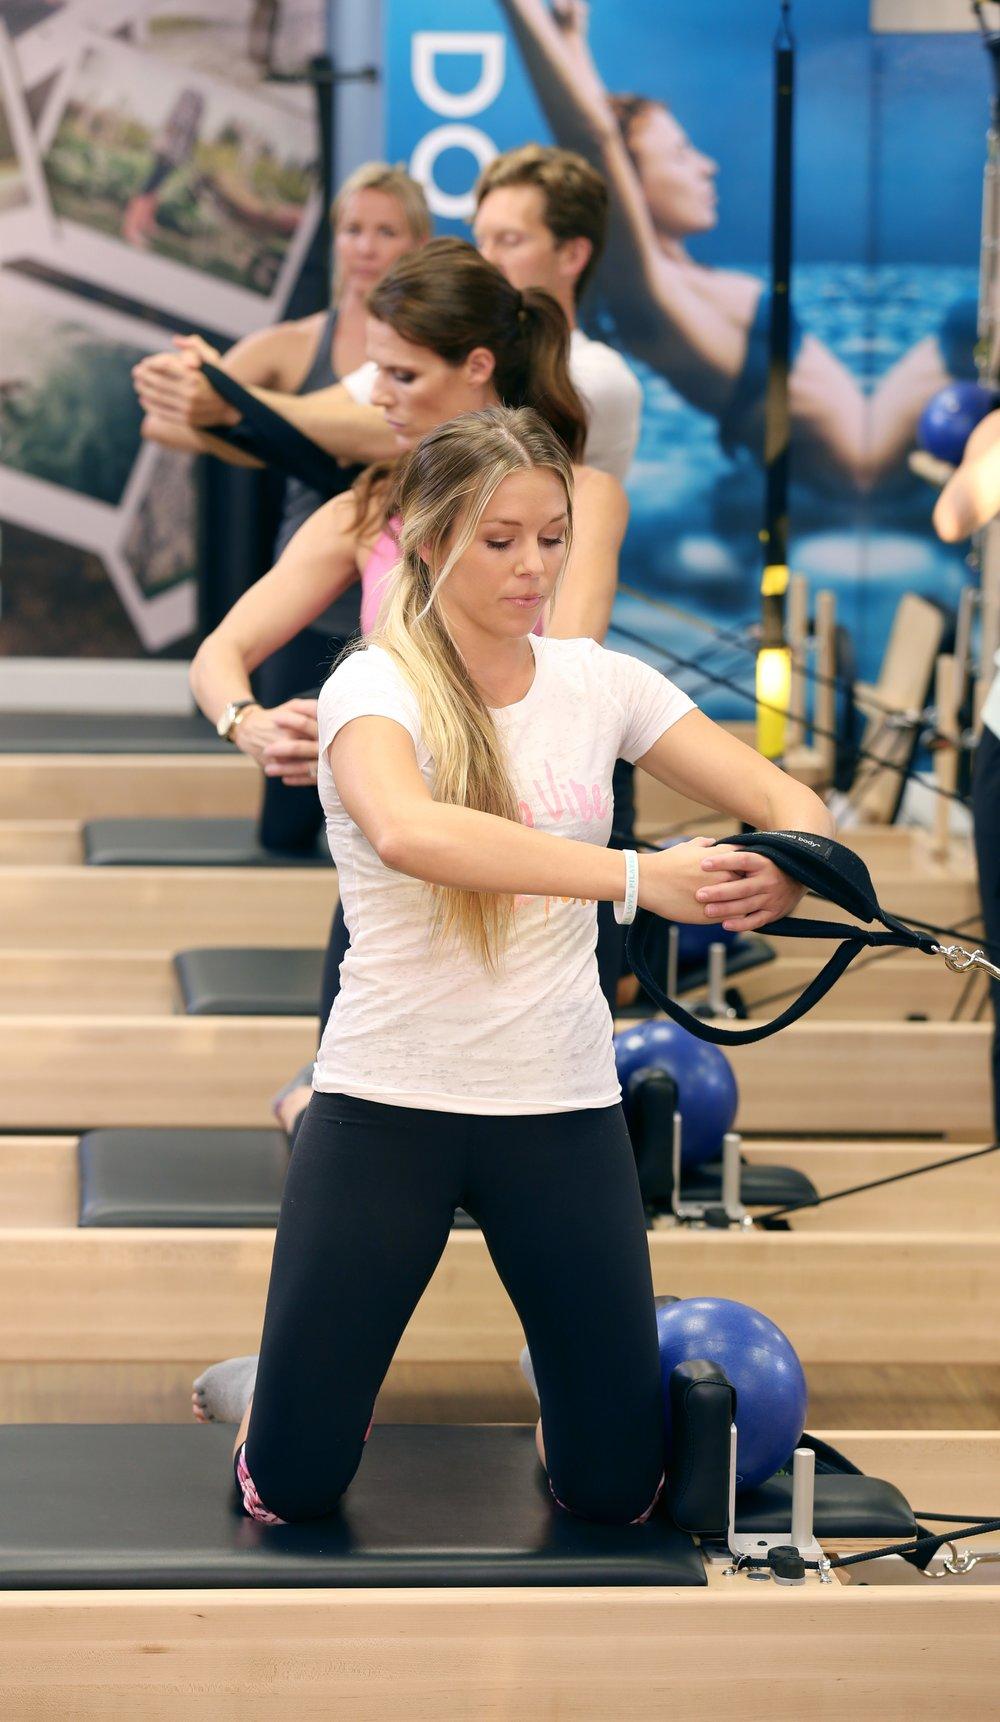 Club Pilates photo 4.jpg